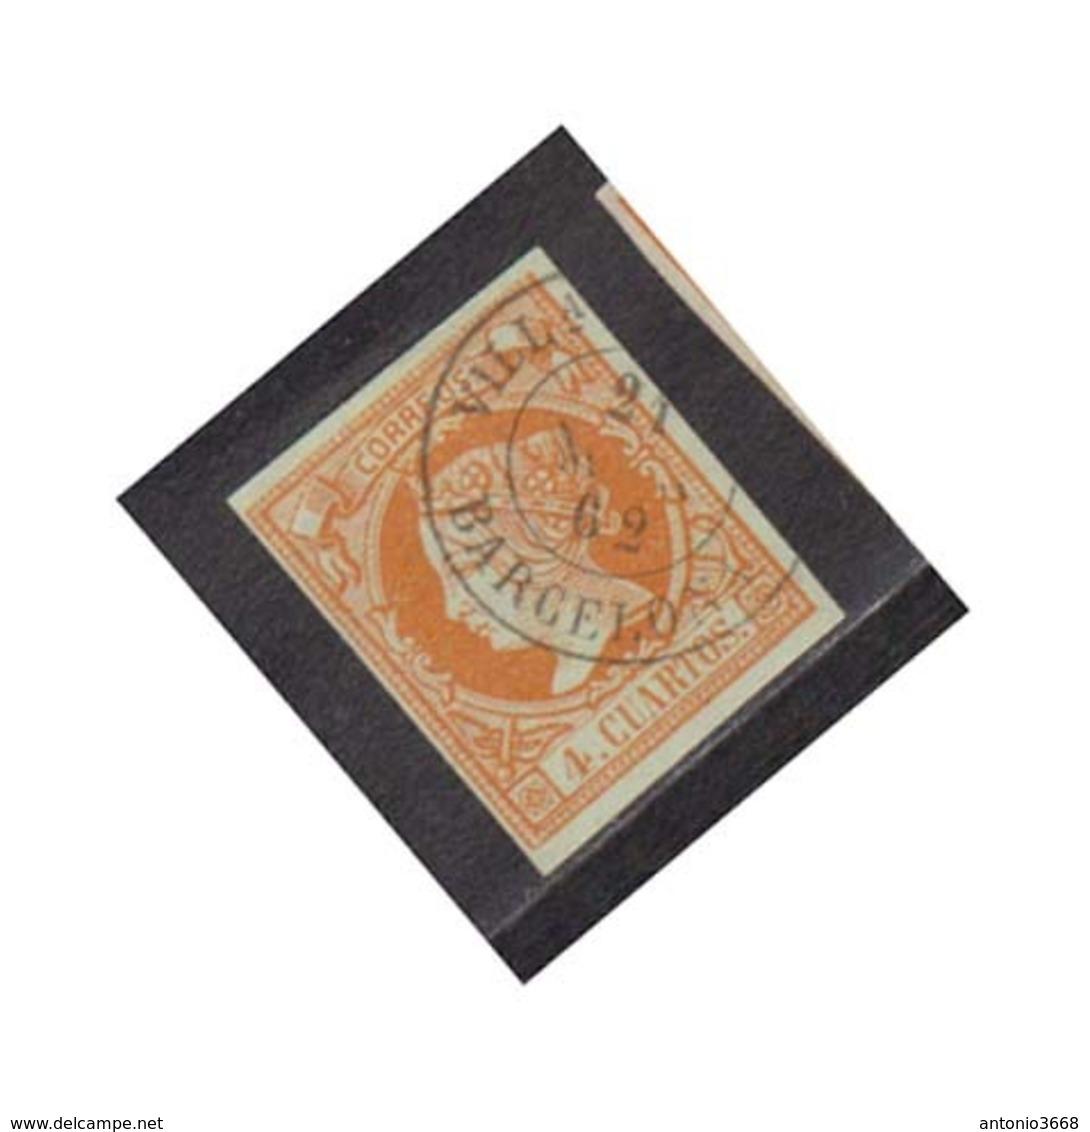 Año 1860 Edifil 52 Sello 4c Isabel II Matasellos Villanueva Y Geltru Barcelona  Tipo II - Used Stamps